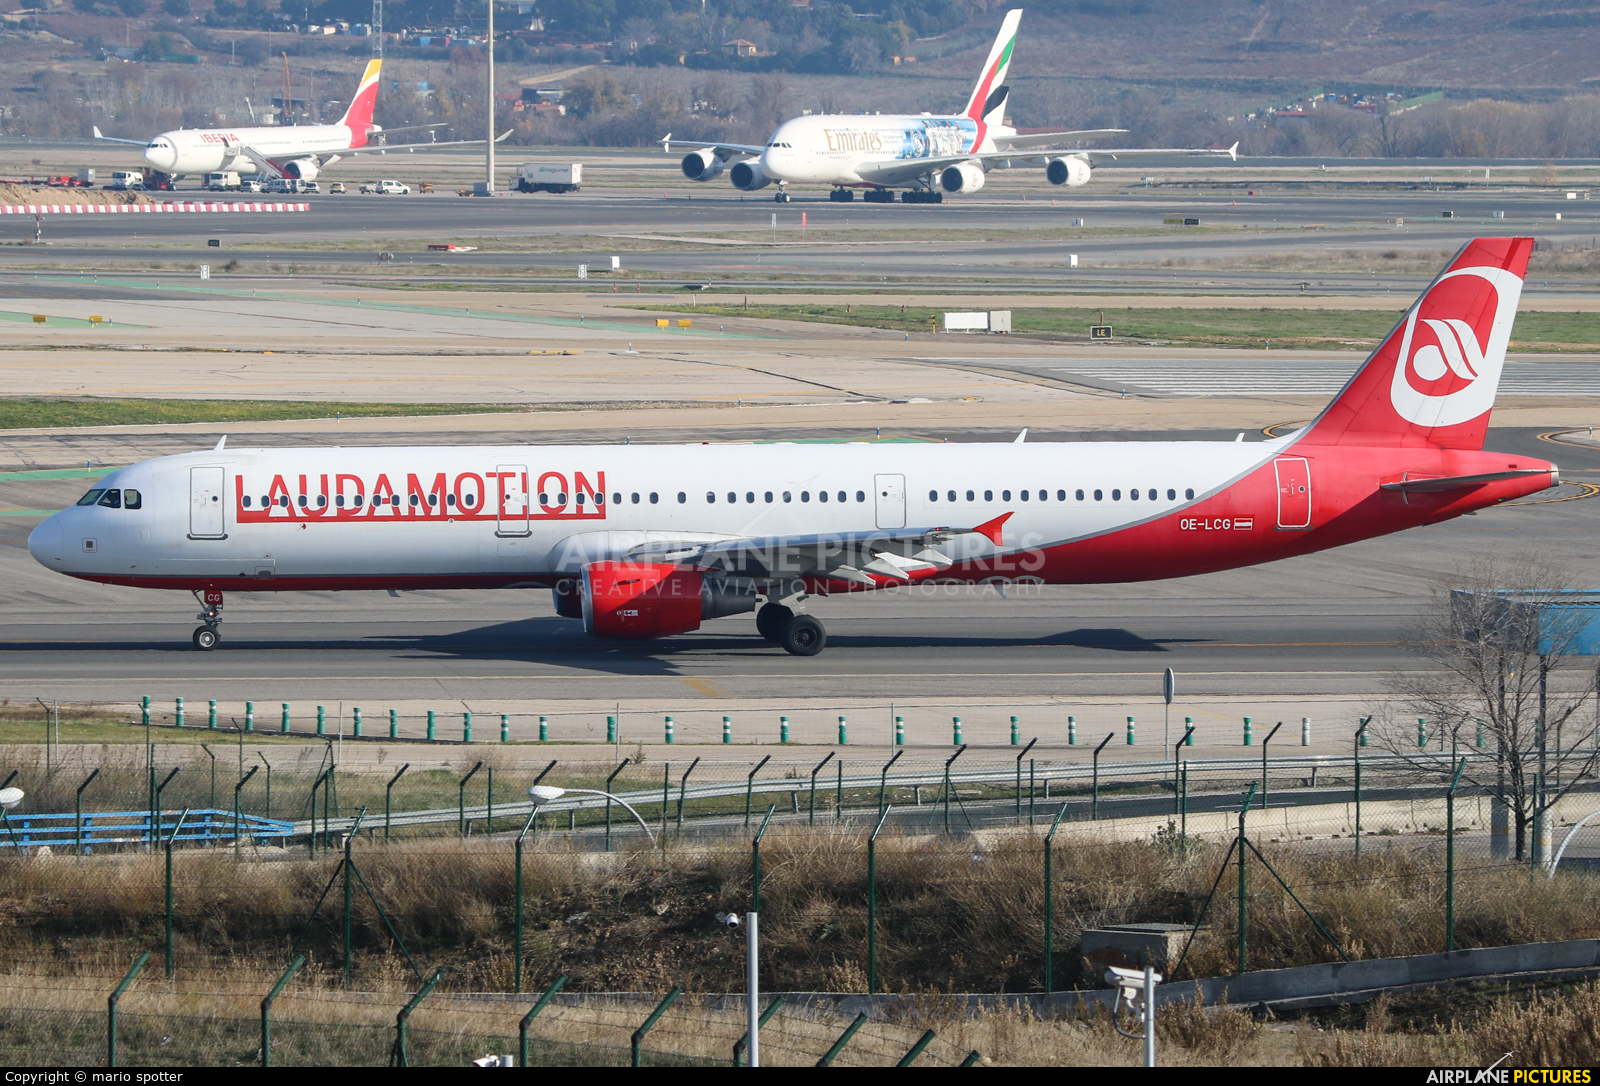 LaudaMotion OE-LCG aircraft at Madrid - Barajas